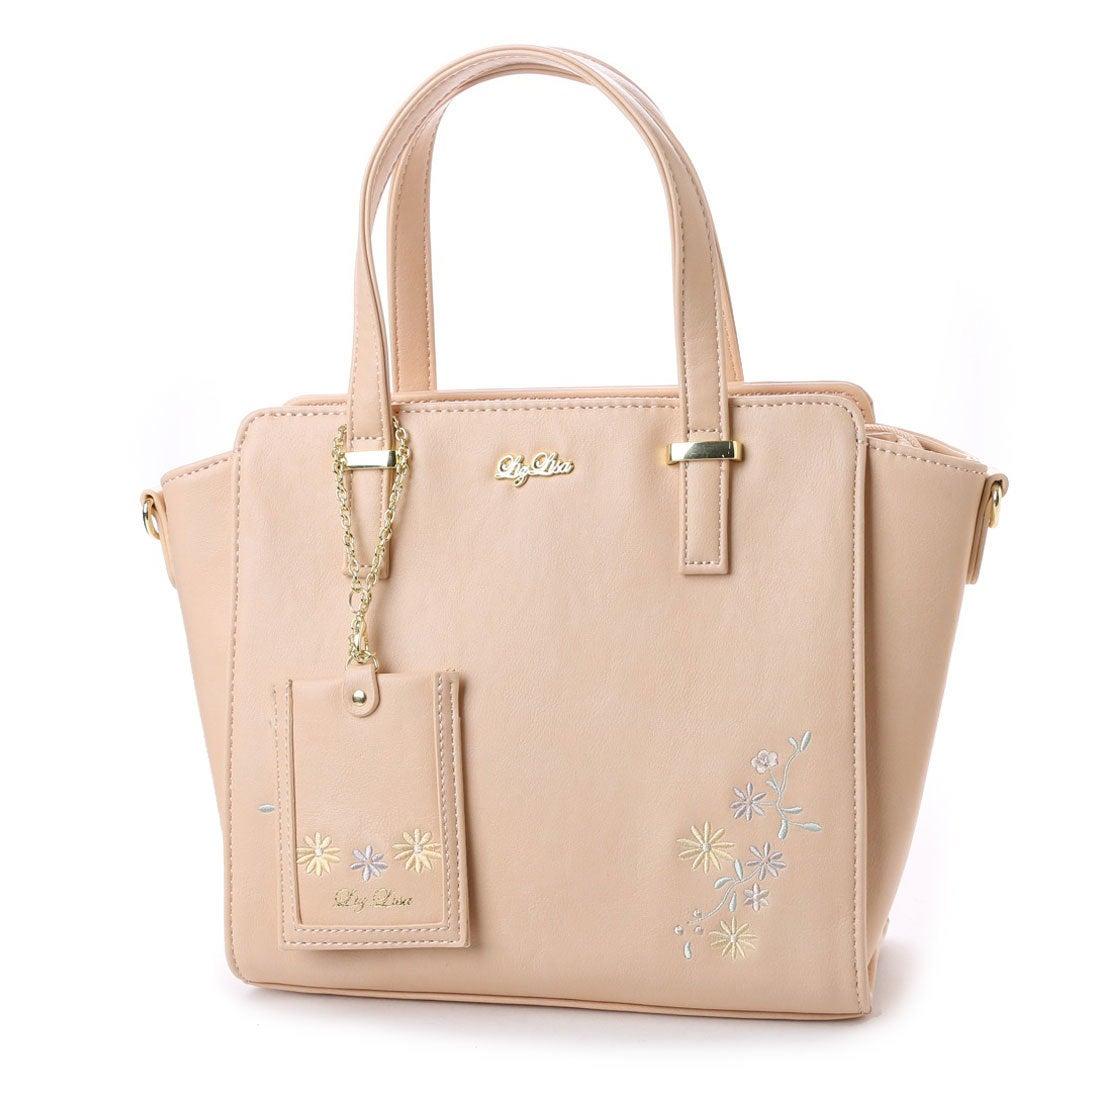 【SALE 50%OFF】リズリサ LIZ LISA ジャスミン お花刺繍2WAYバッグ (ピンク) レディース